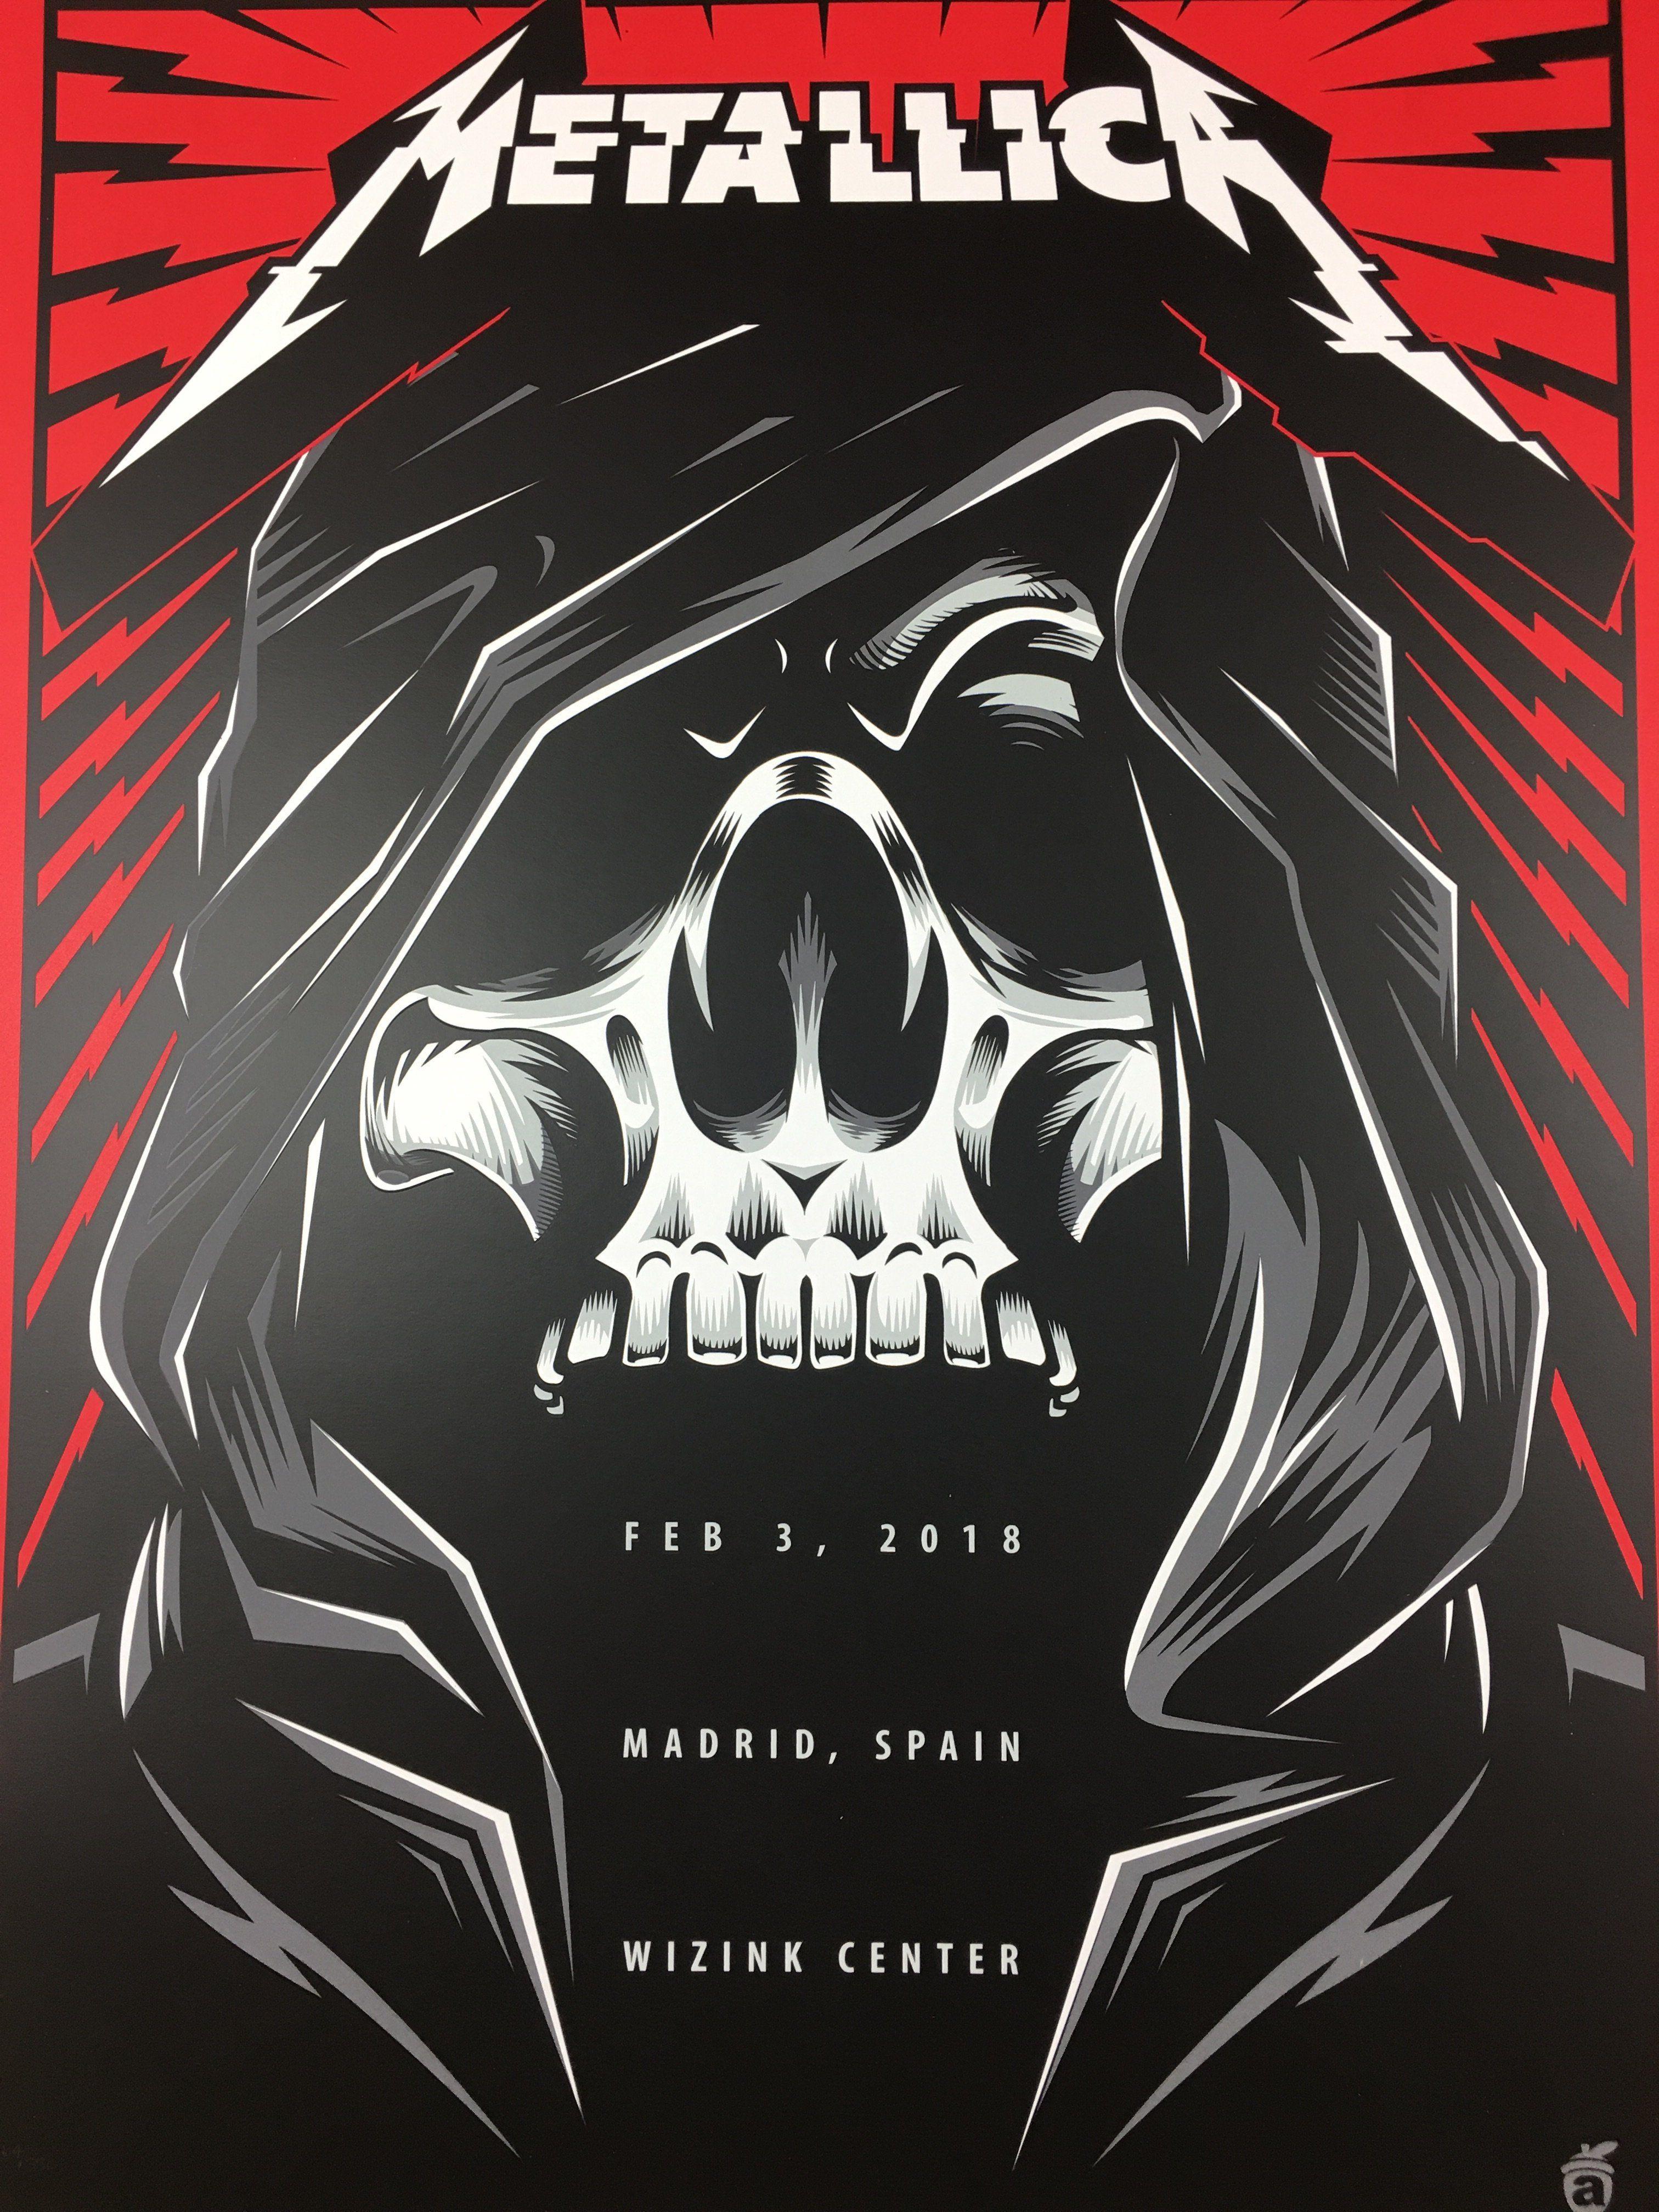 Metallica 2018 Acorn Poster Madrid Spain Wizink Center